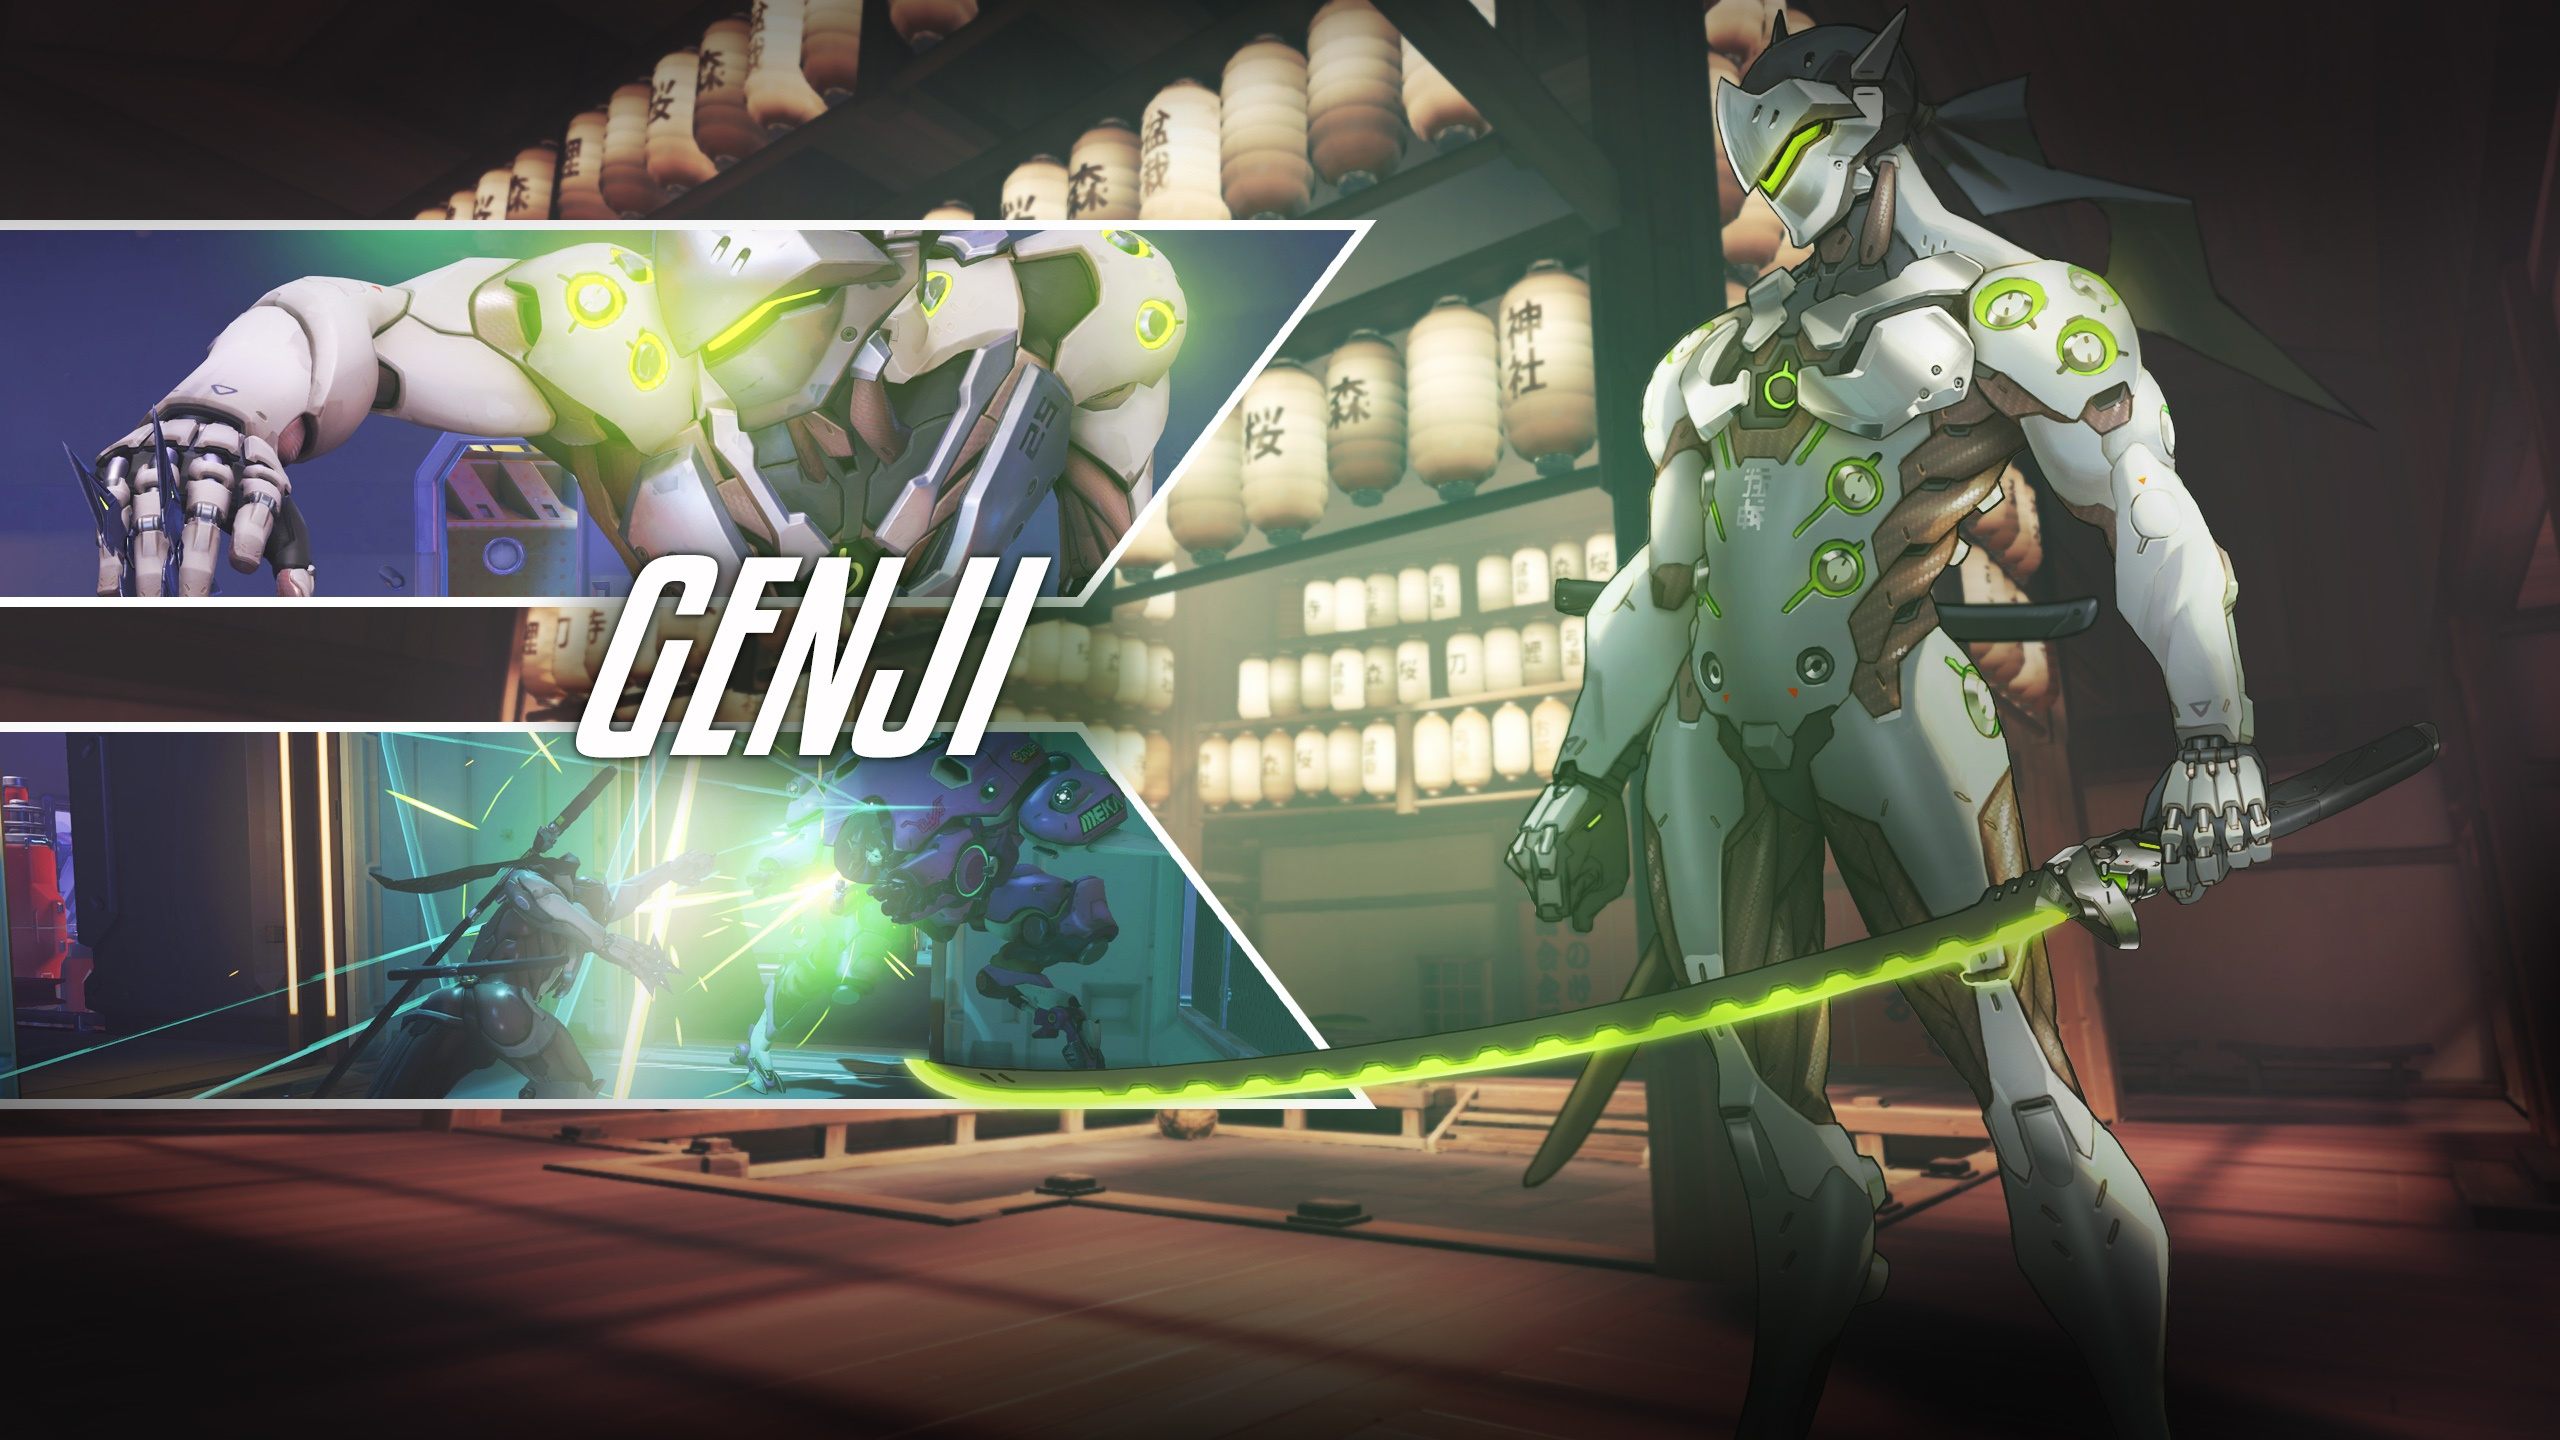 Genji Overwatch Wallpapers in jpg format for free download